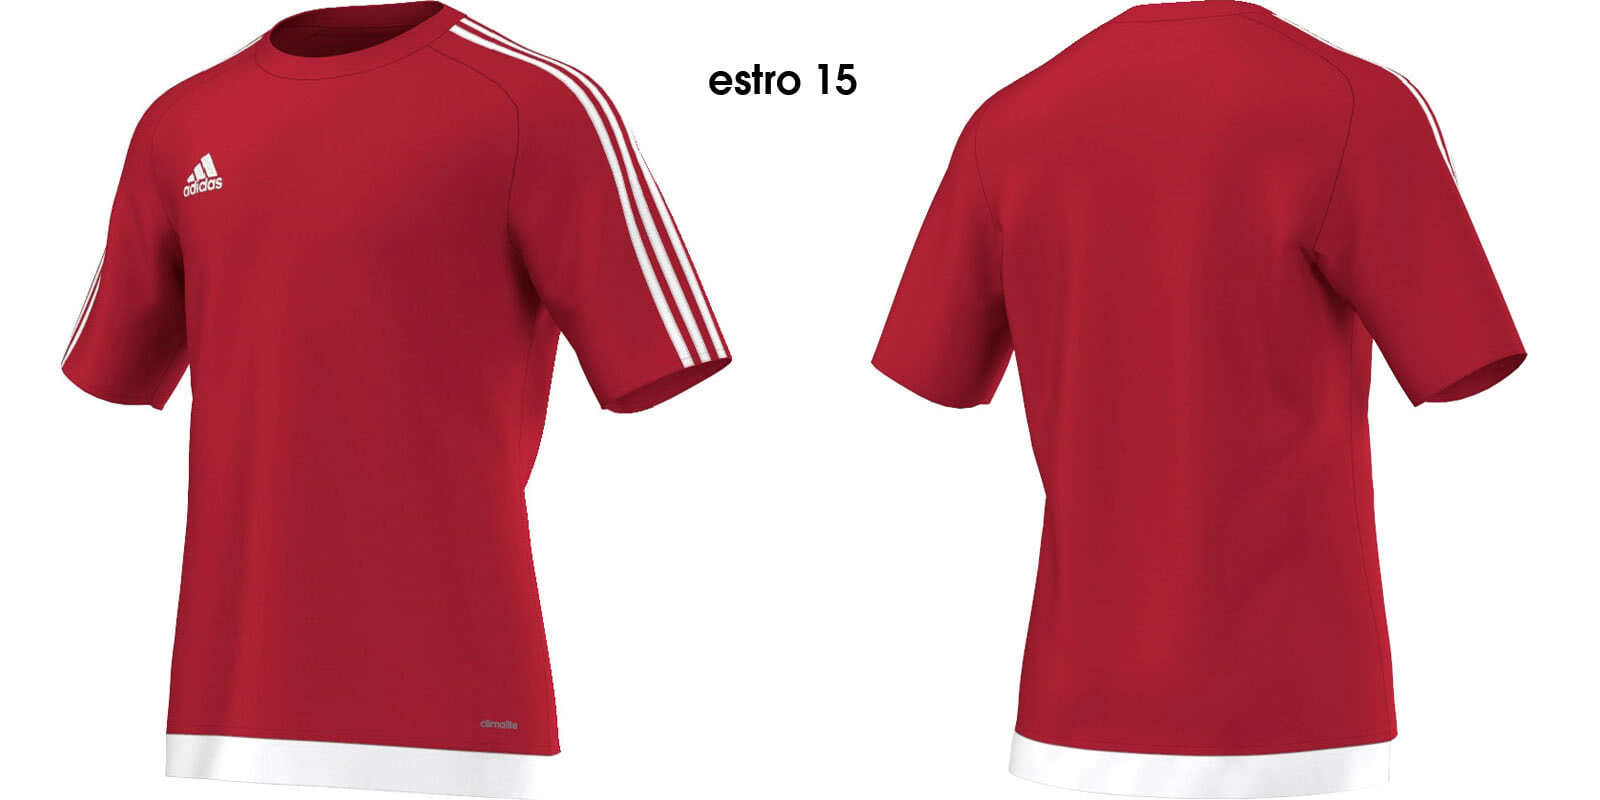 adidas Estro 15 kurzarm Fußballtrikot WeißBlau